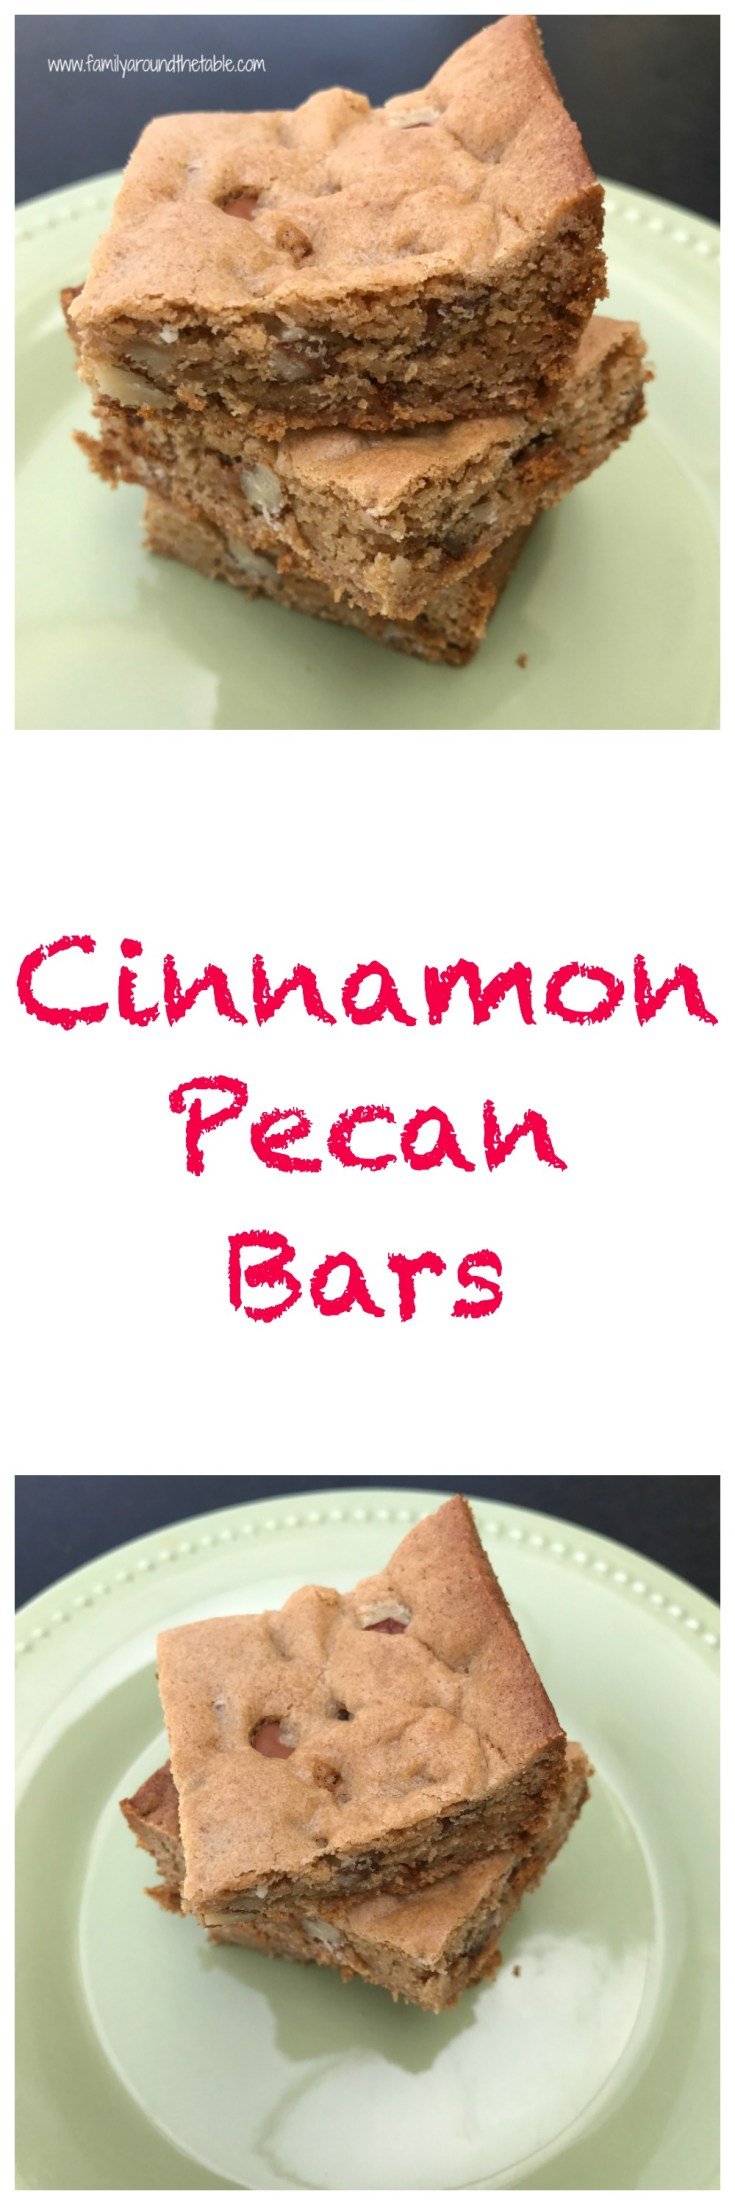 Enjoy cinnamon pecan bars with a cup of coffee or tea.